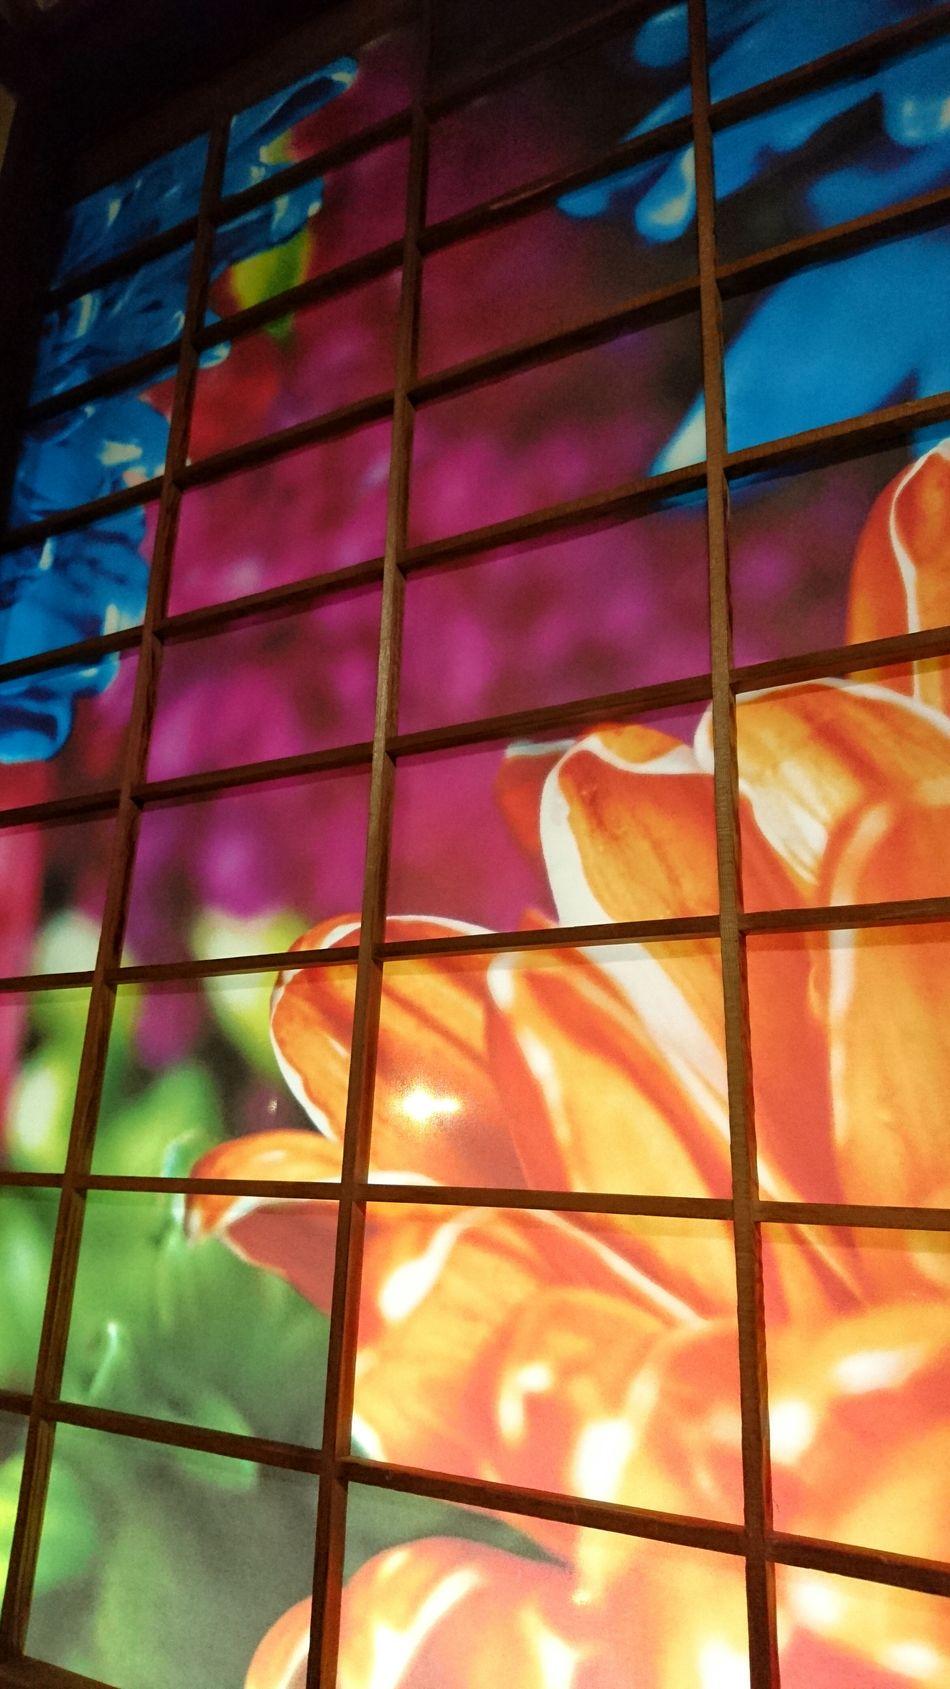 Colorful Flowers Shoji Window 蜷川実花 Ninagawa Mika Art Work Beautiful View Hello World Wonderful View Enjoying Life 道後温泉本館 (dogo Onsen) Matsuyama Travel Photography